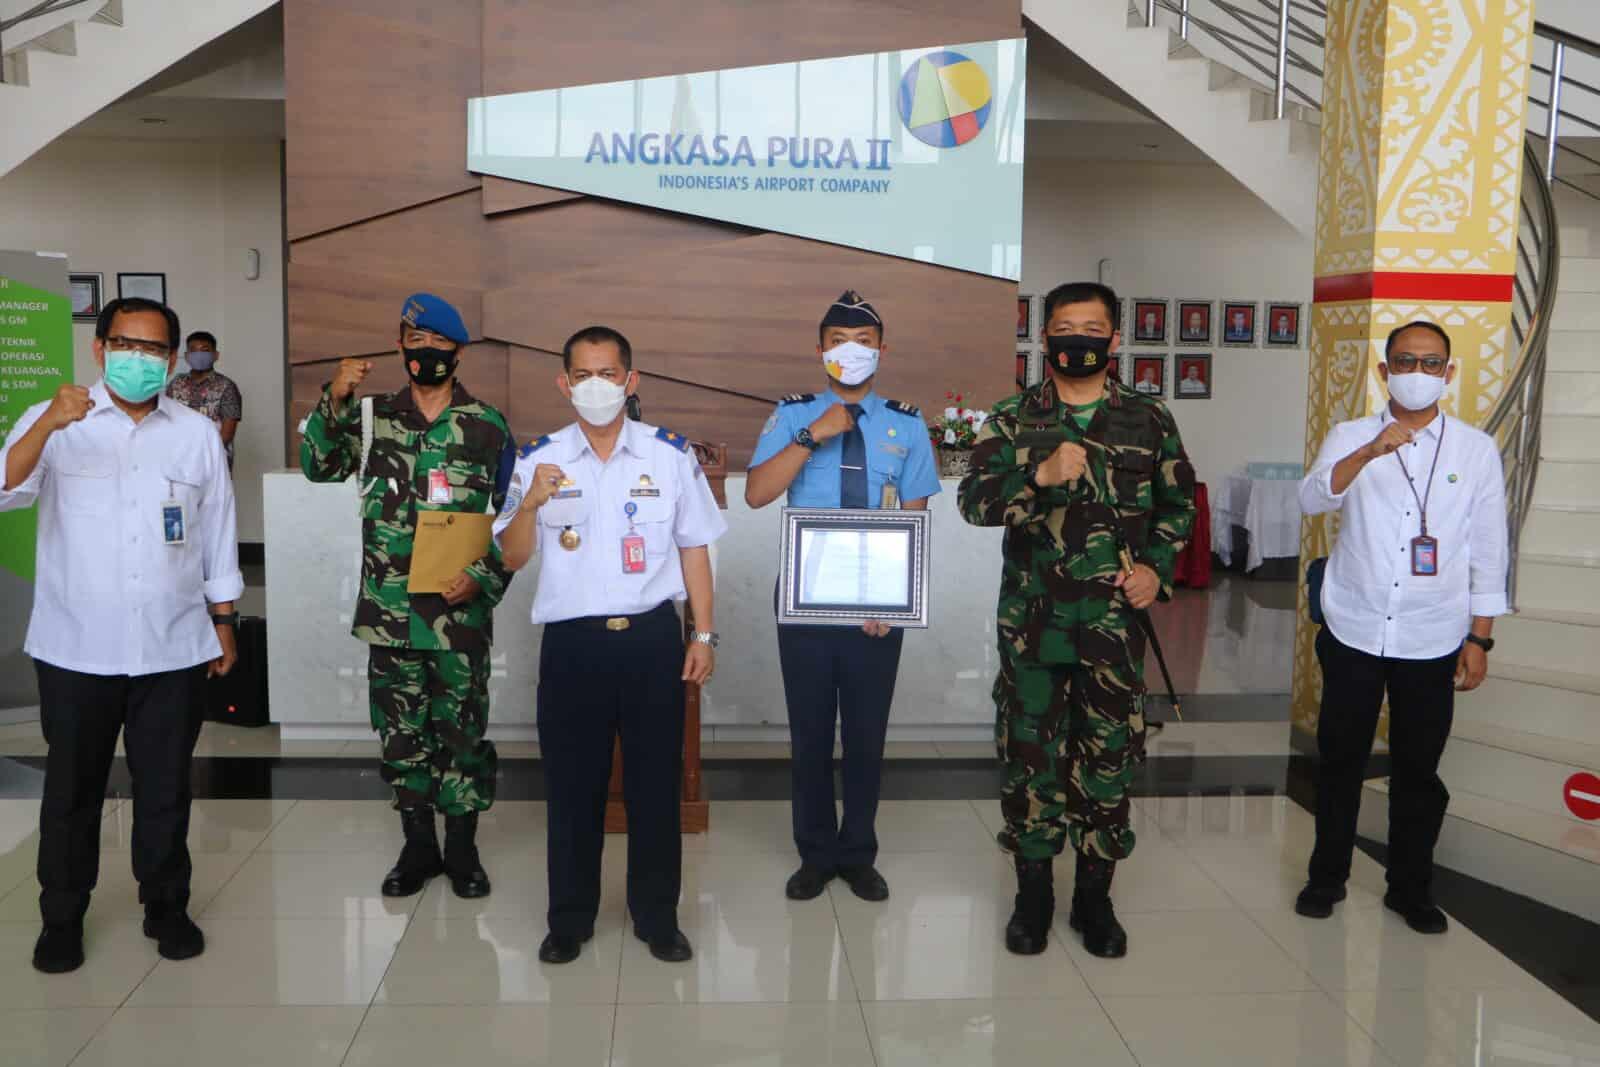 Gagalkan Narkoba, BKO TNI AU Dan Petugas Avsec Terima Penghargaan